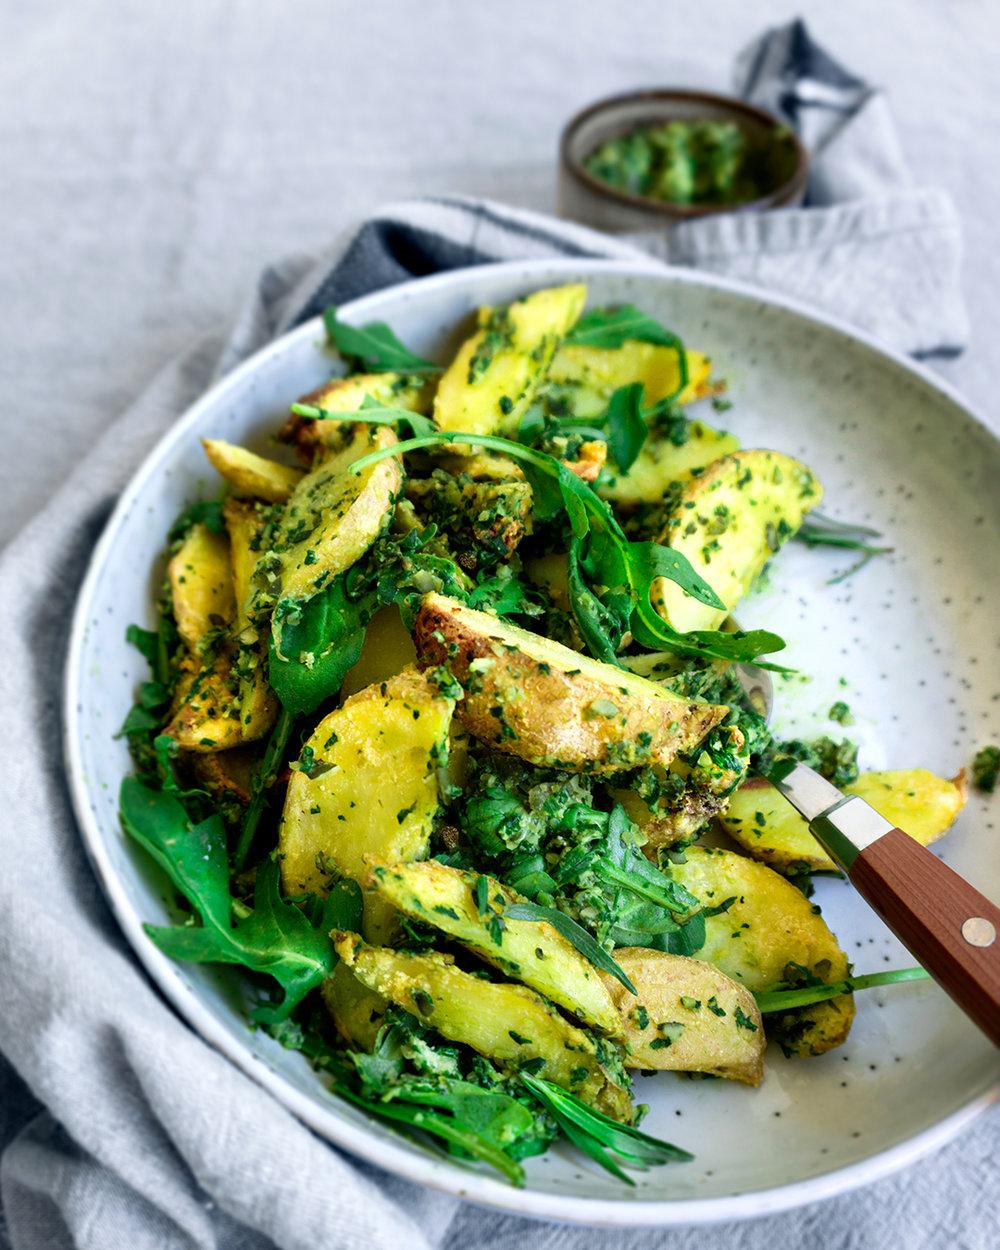 aardappelsalade-dragonpesto-vegan-whole-foods-olievrij-notenvrij-glutenvrij.jpg